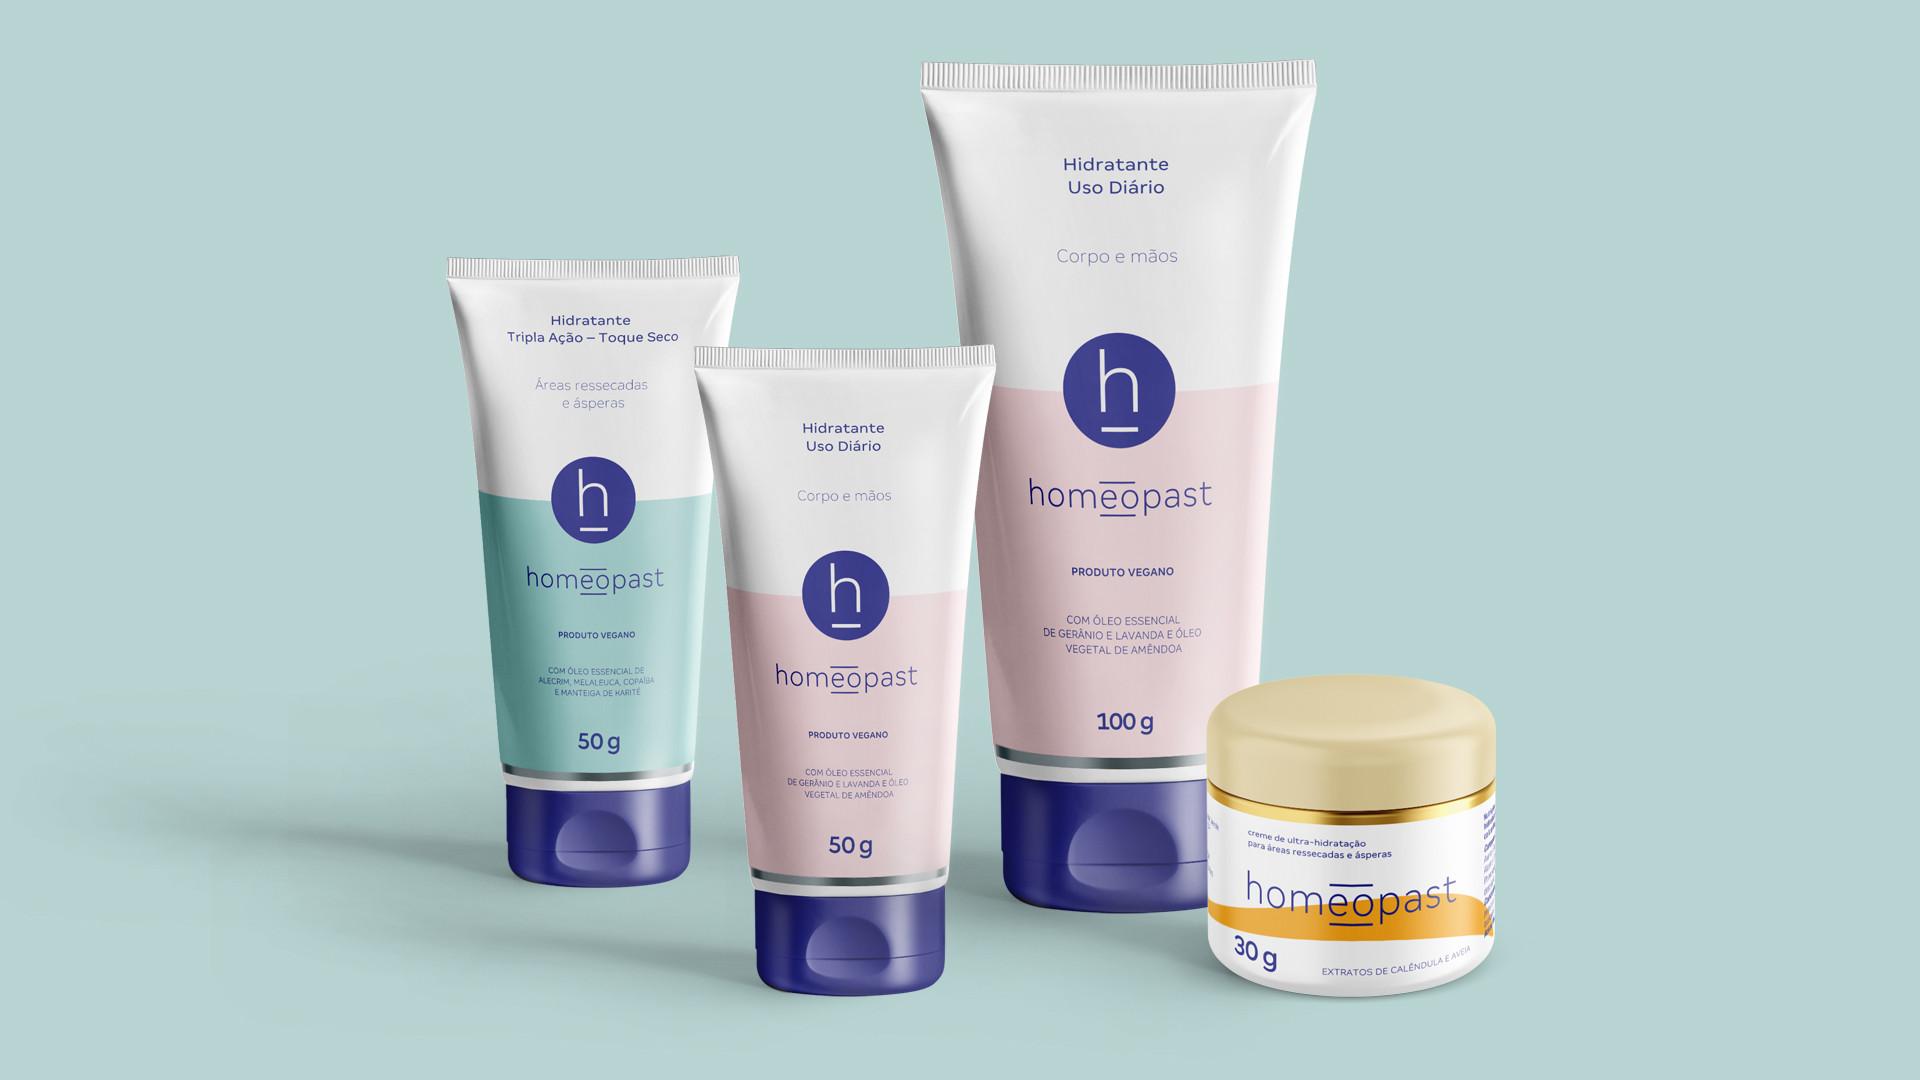 Homeopast - Pack & 3d